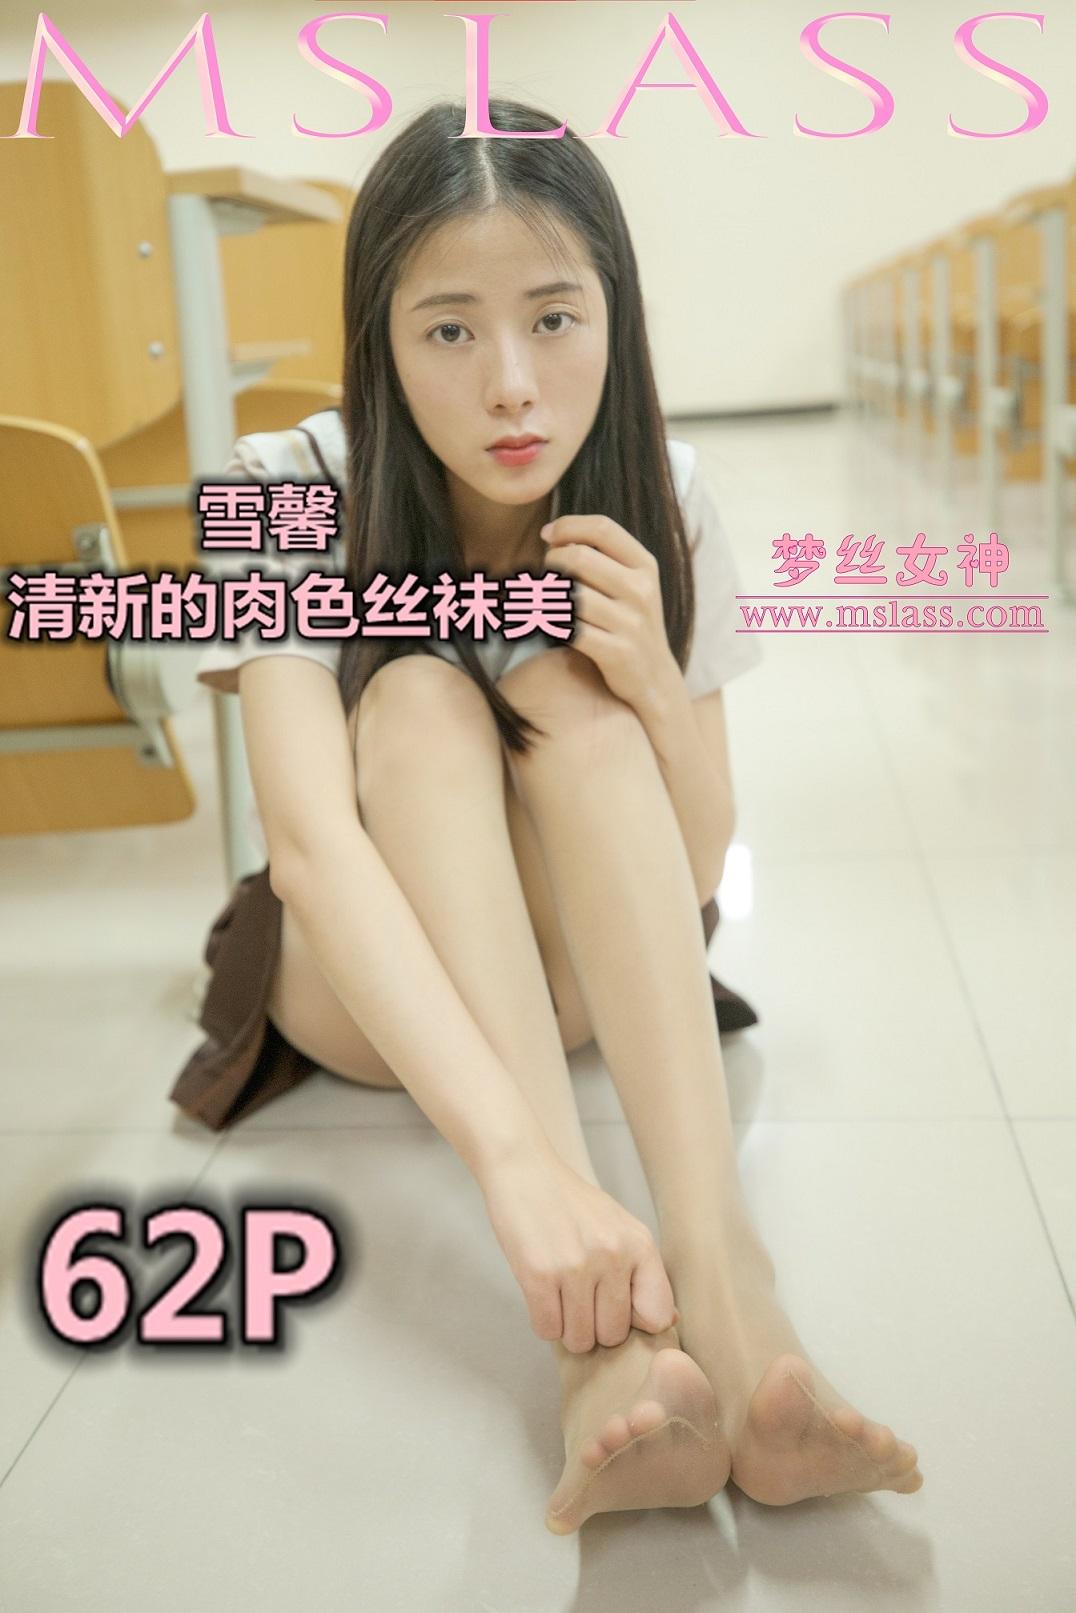 [MSLASS]梦丝女神 雪馨 清新的丝袜美